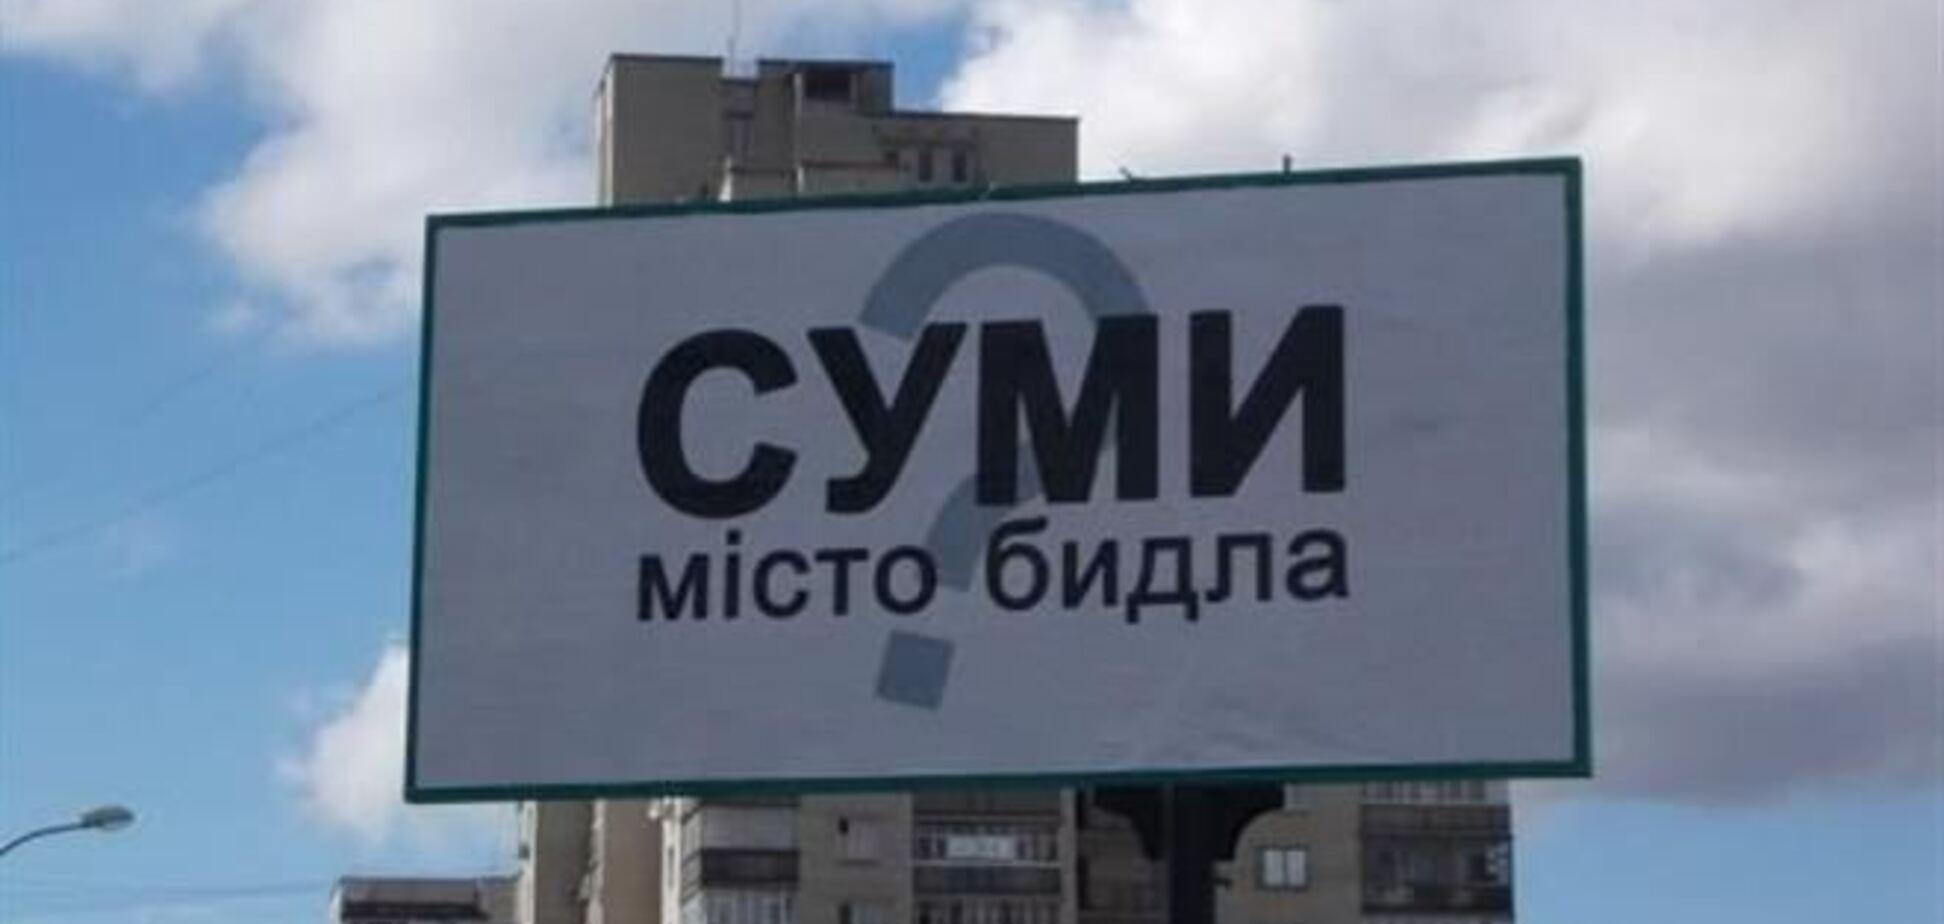 В Сумах возник скандал вокруг билбордов 'Місто бидла?'